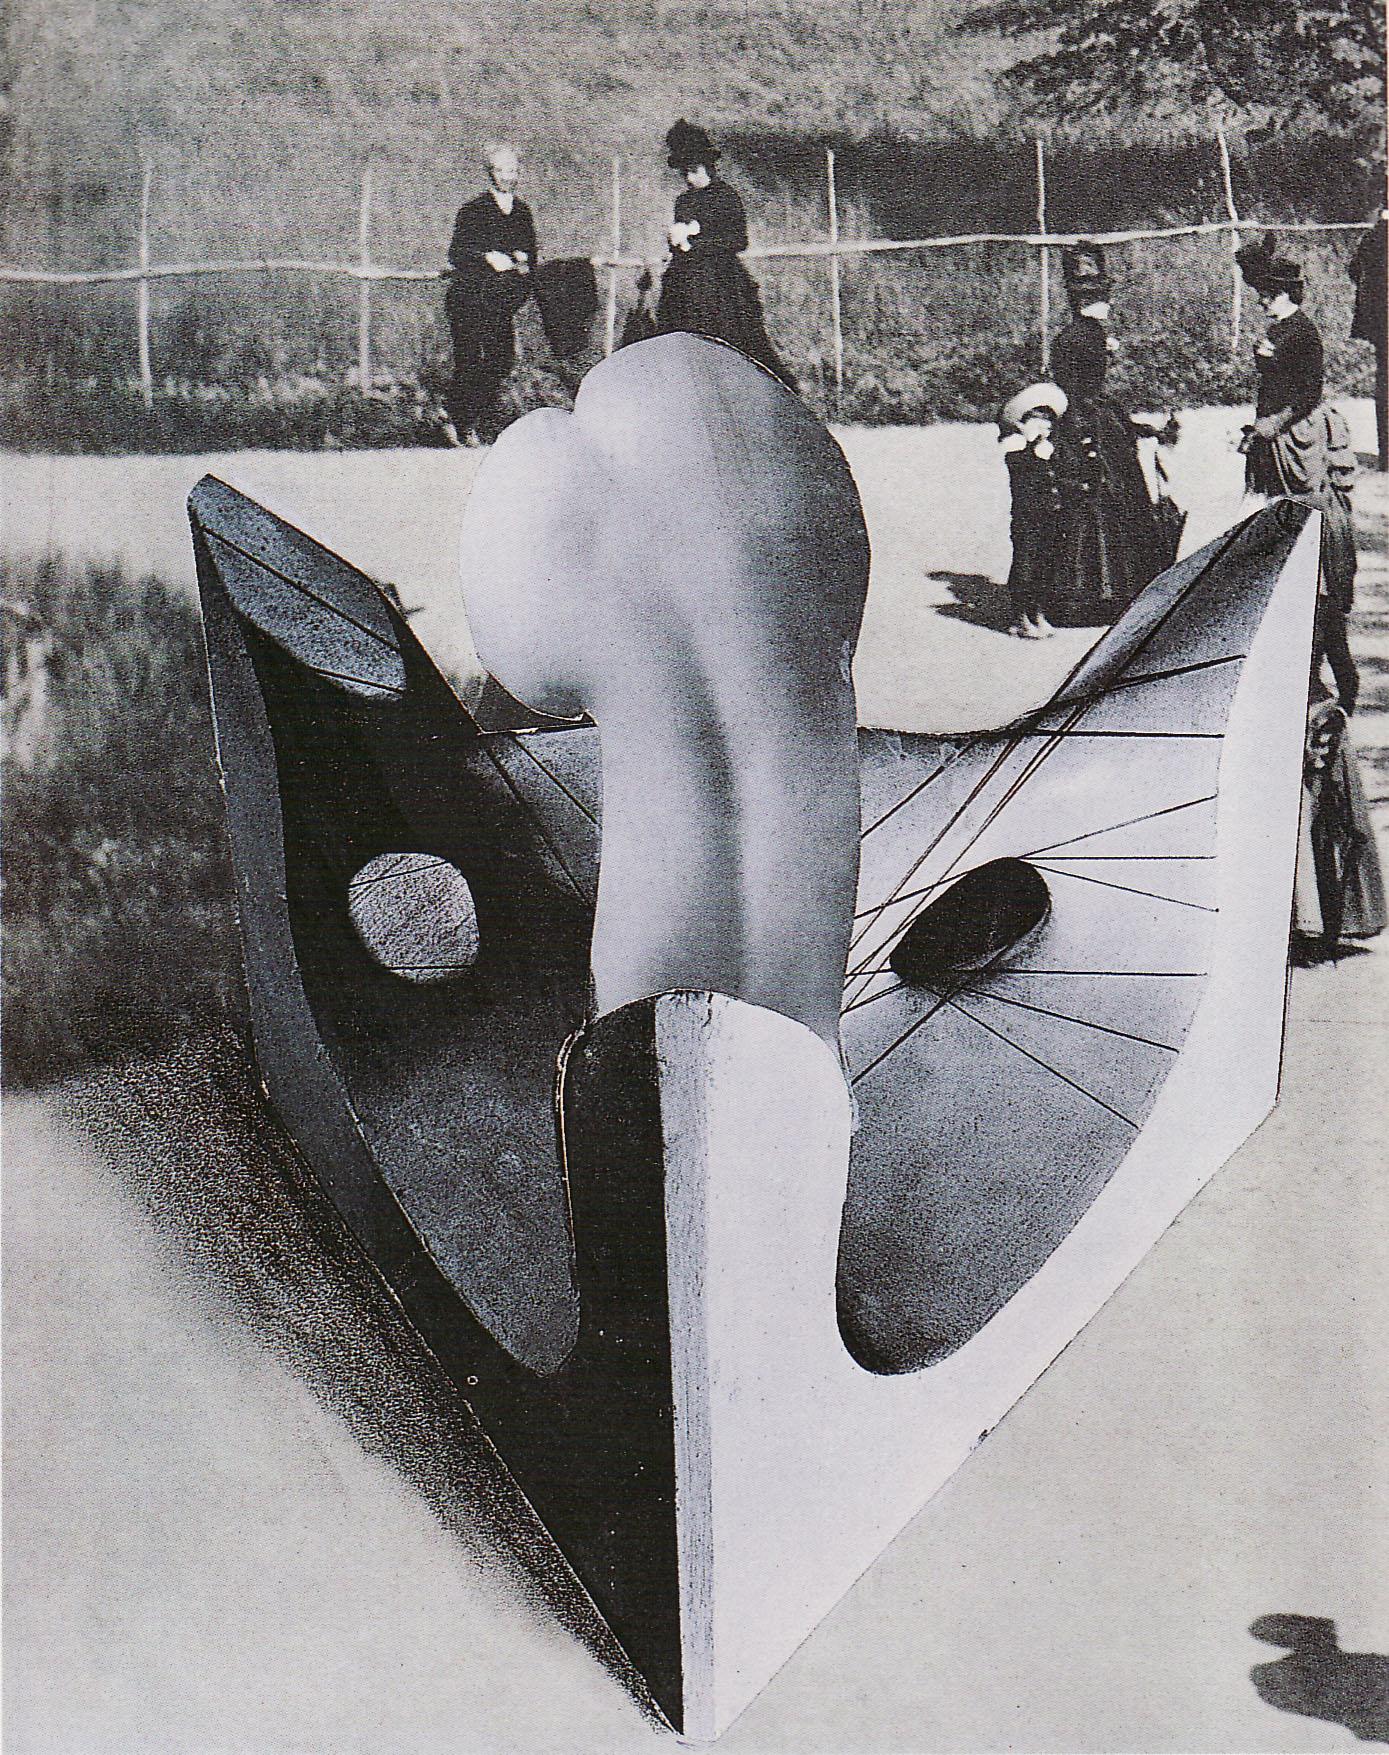 Karel Teige- Collage# 306, 1945. (c) Nachlass Karel Teige